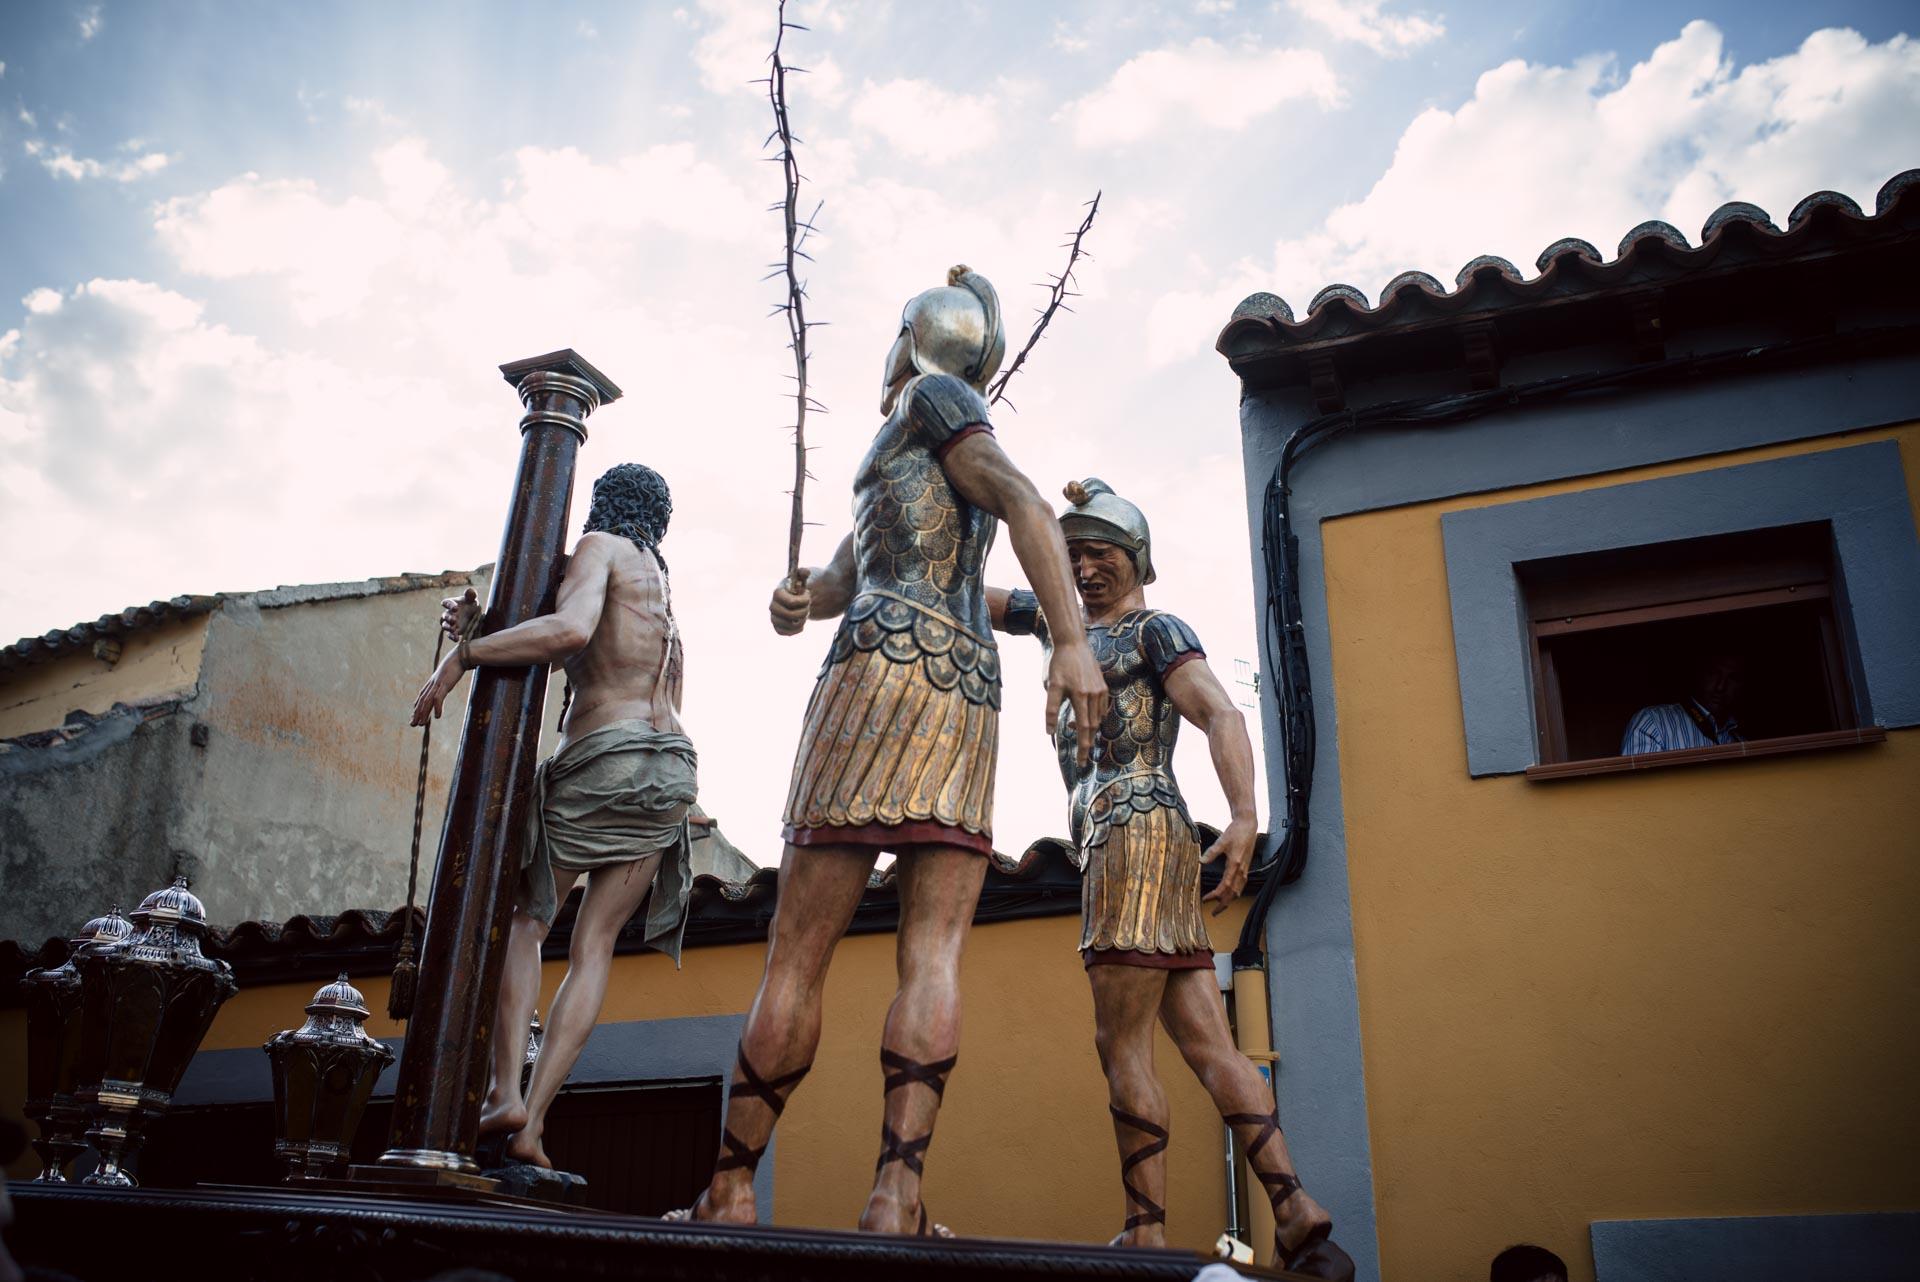 Reportaje fotográfico de Semana Santa Medina de Rioseco. Reportaje fotográfico